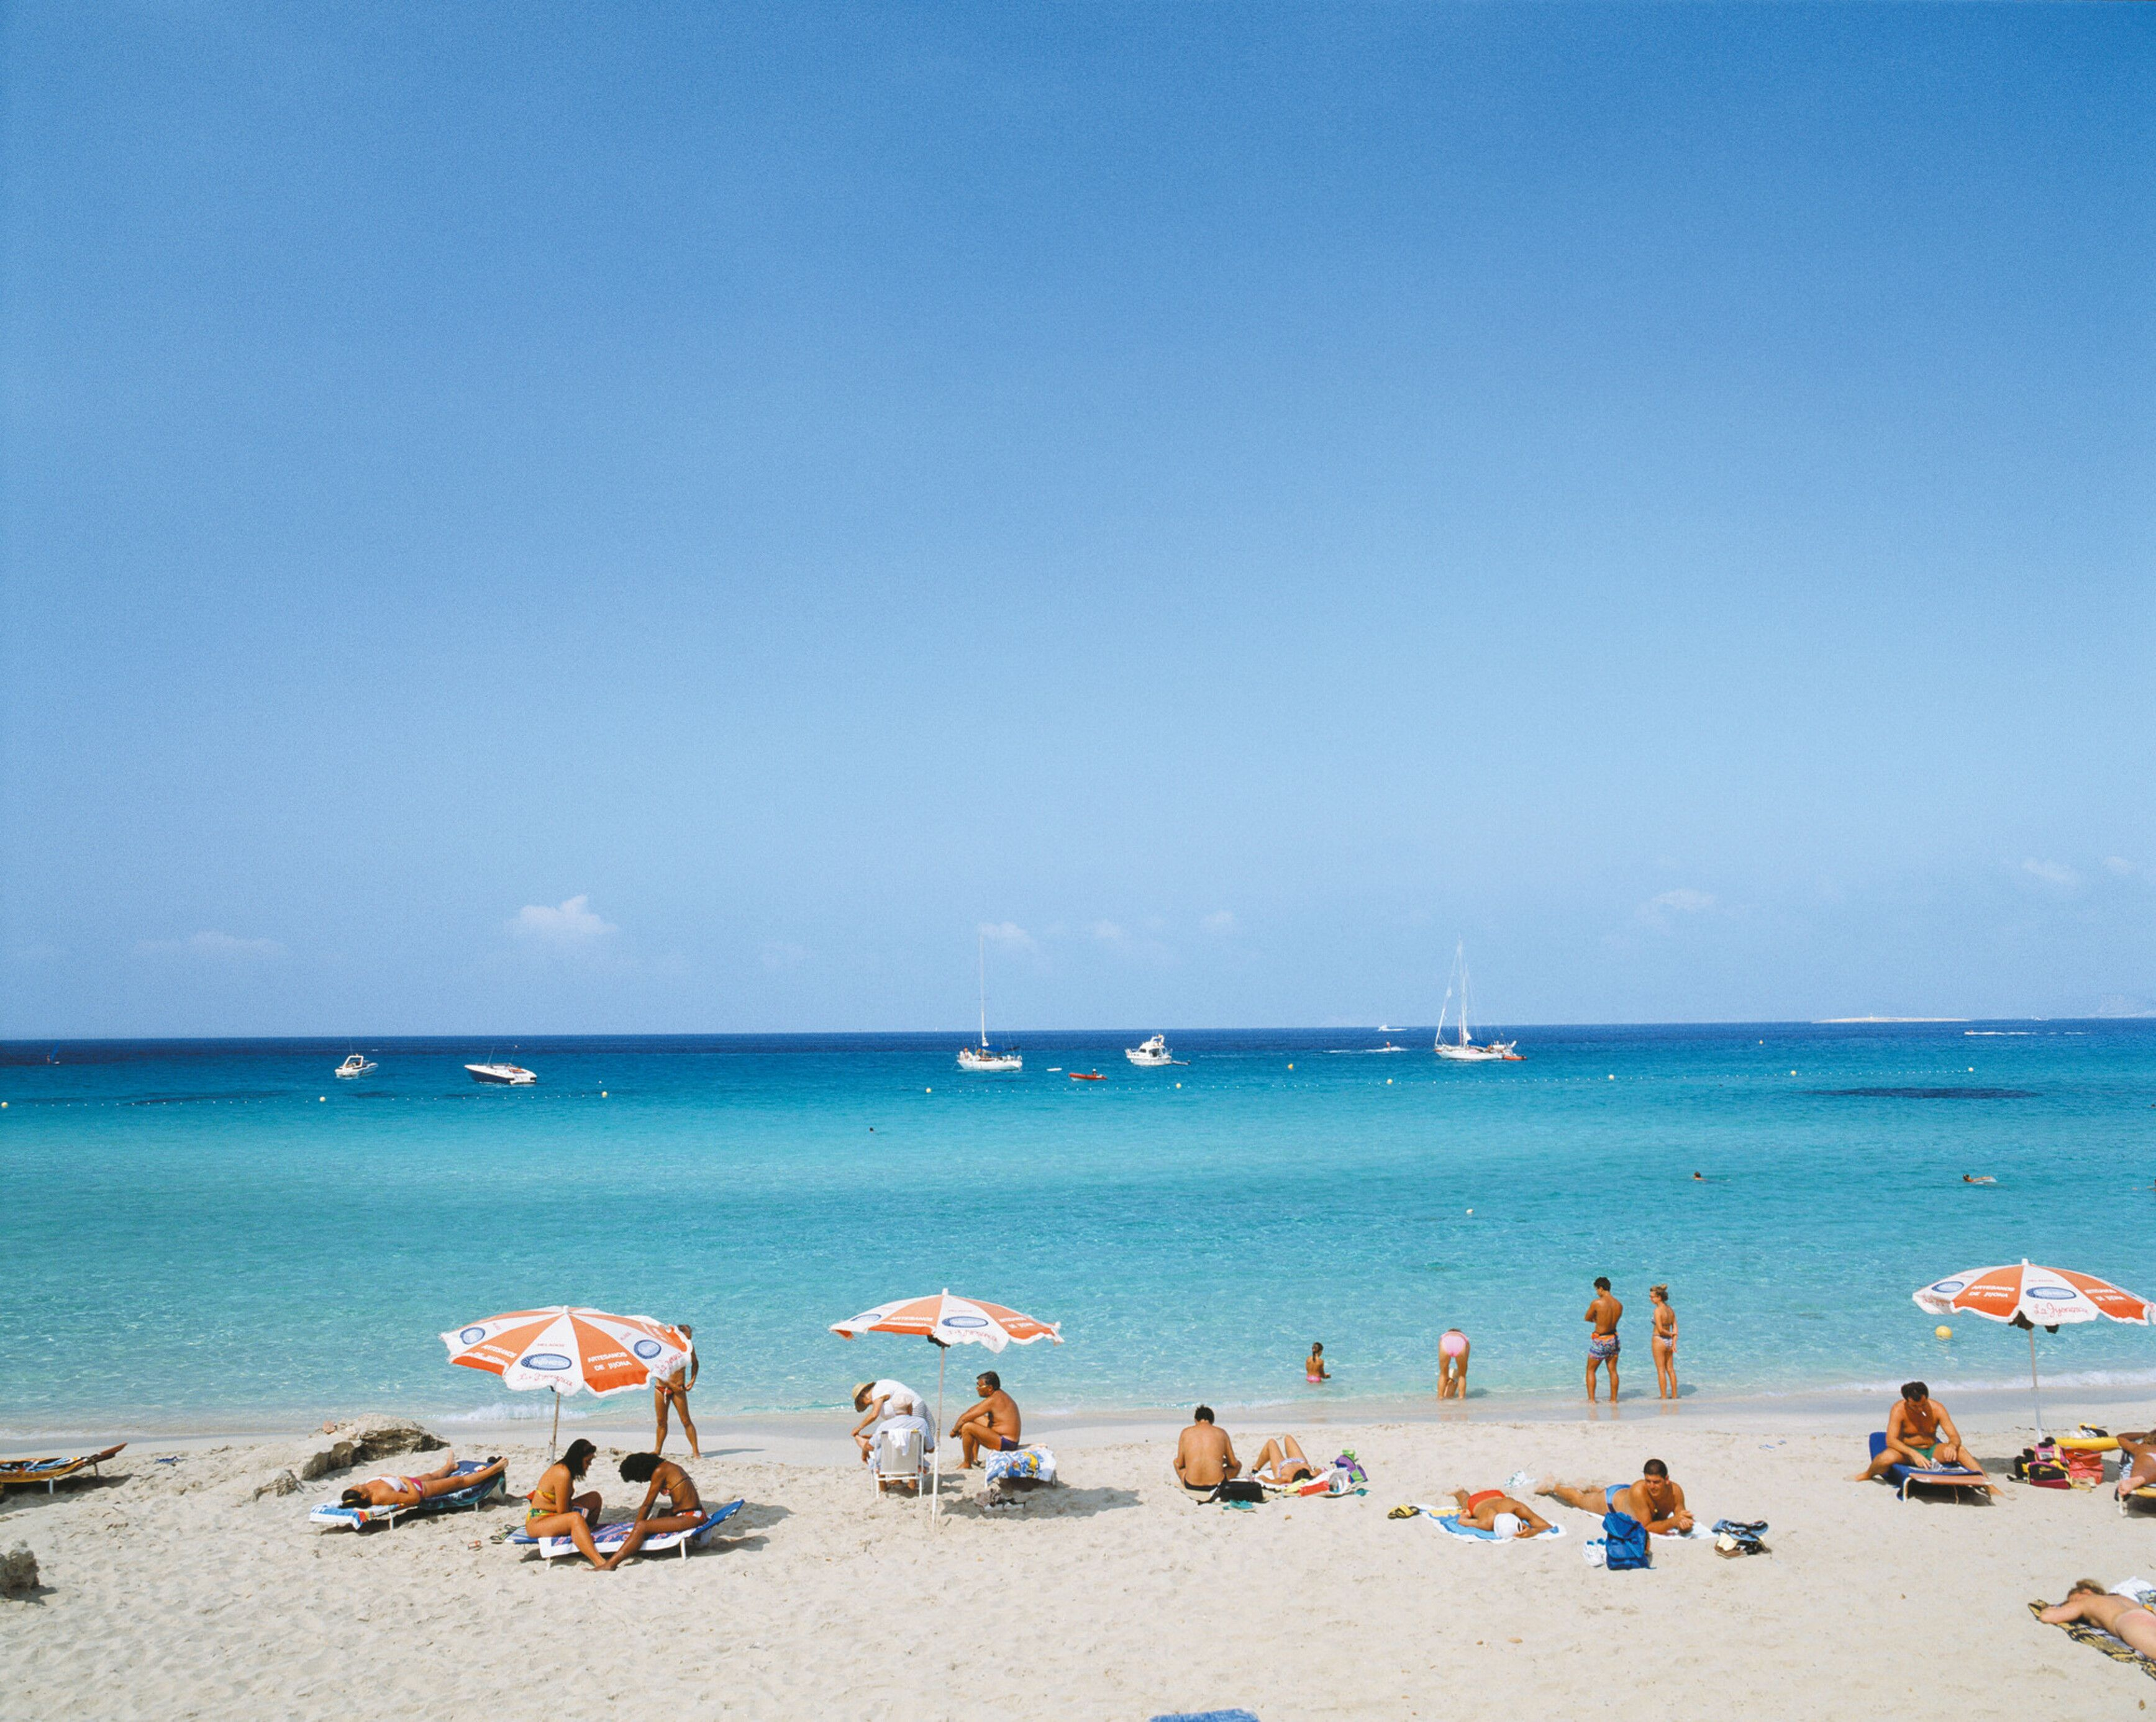 Formentera Beach Paisajes, Playa, Caribe